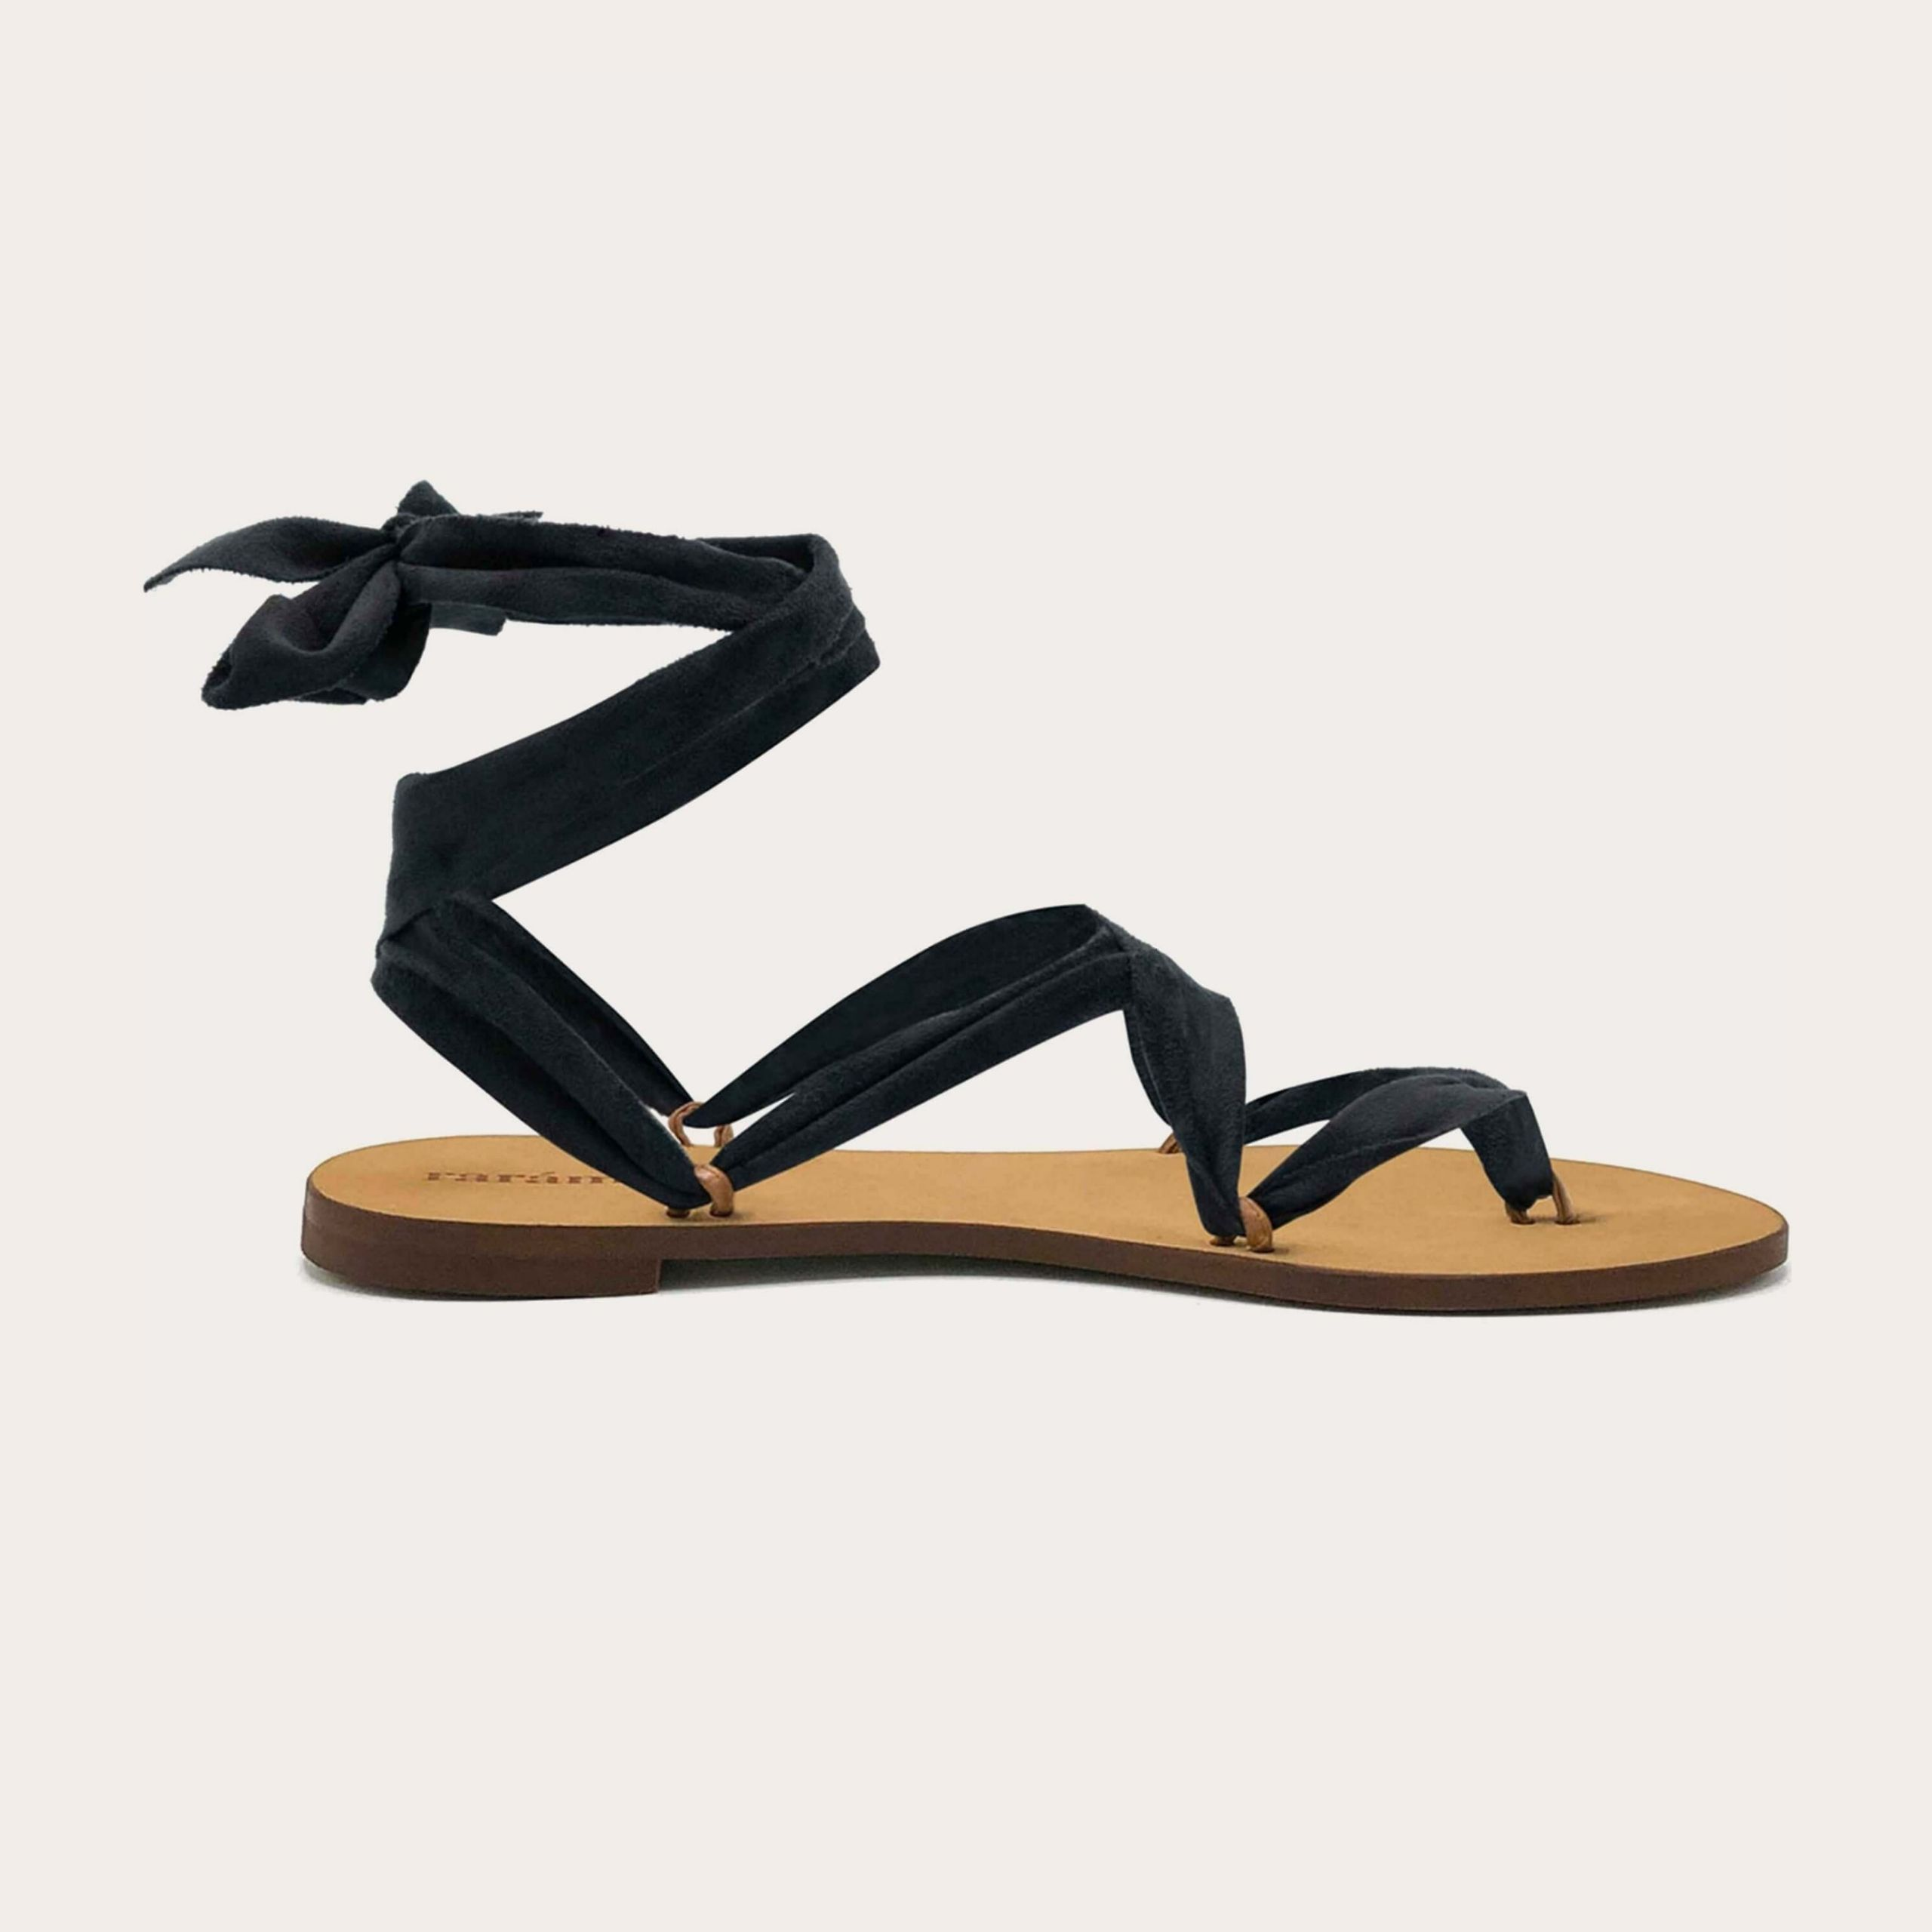 cancun-vegan_1_lintsandalen sandals travelsandals vegan sustainable sandals wikkelsandalen